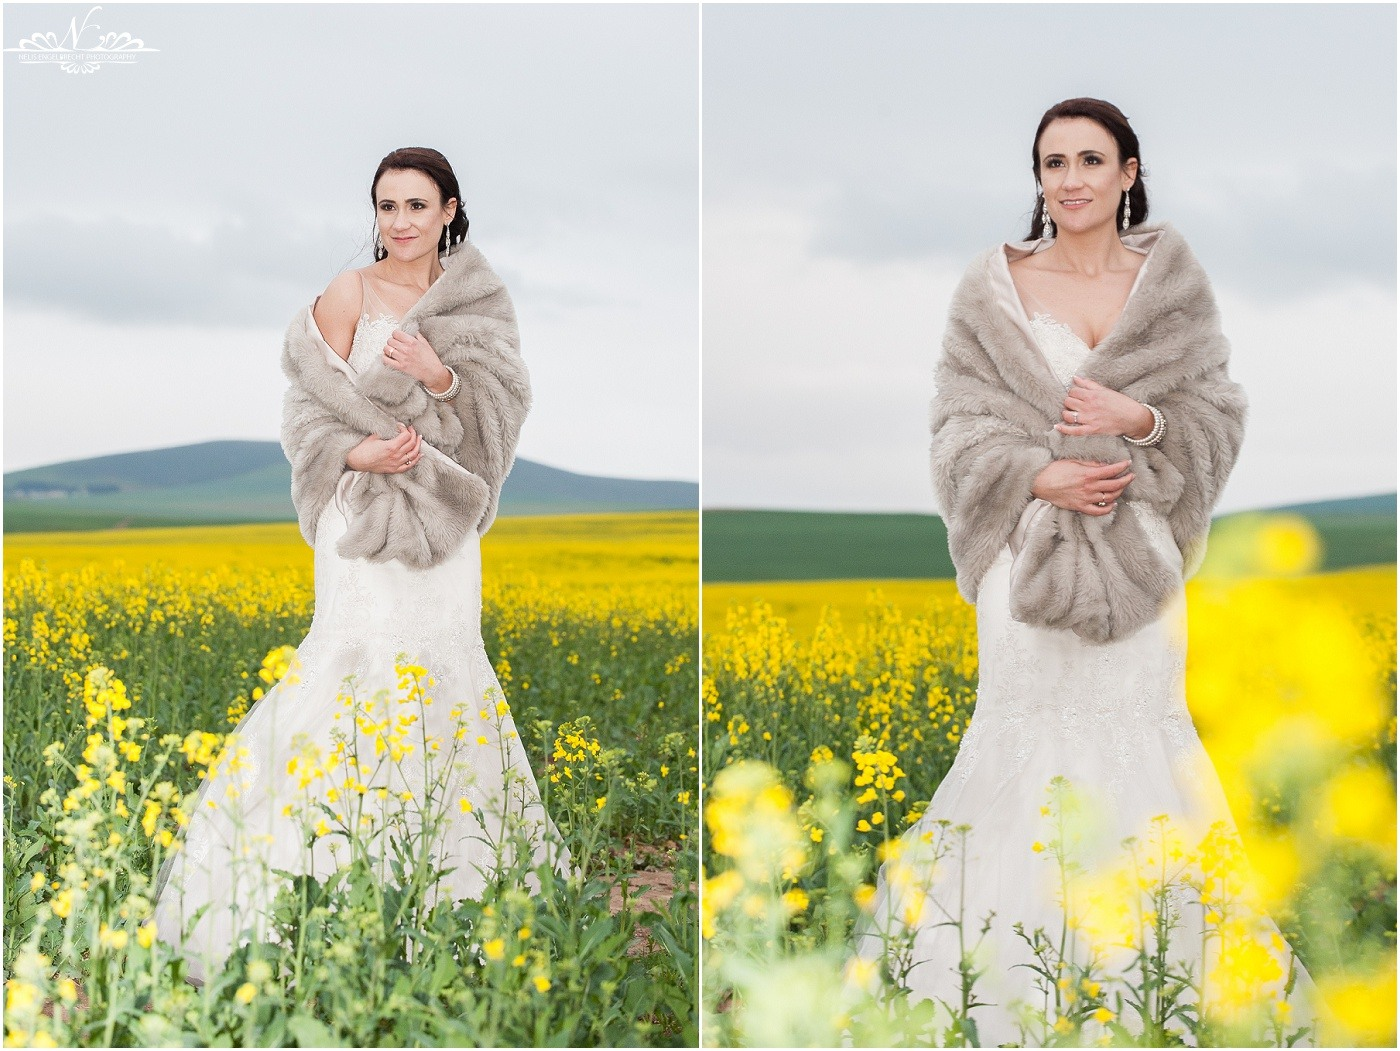 Eensgezind-Wedding-Photos-Nelis-Engelbrecht-Photography-150